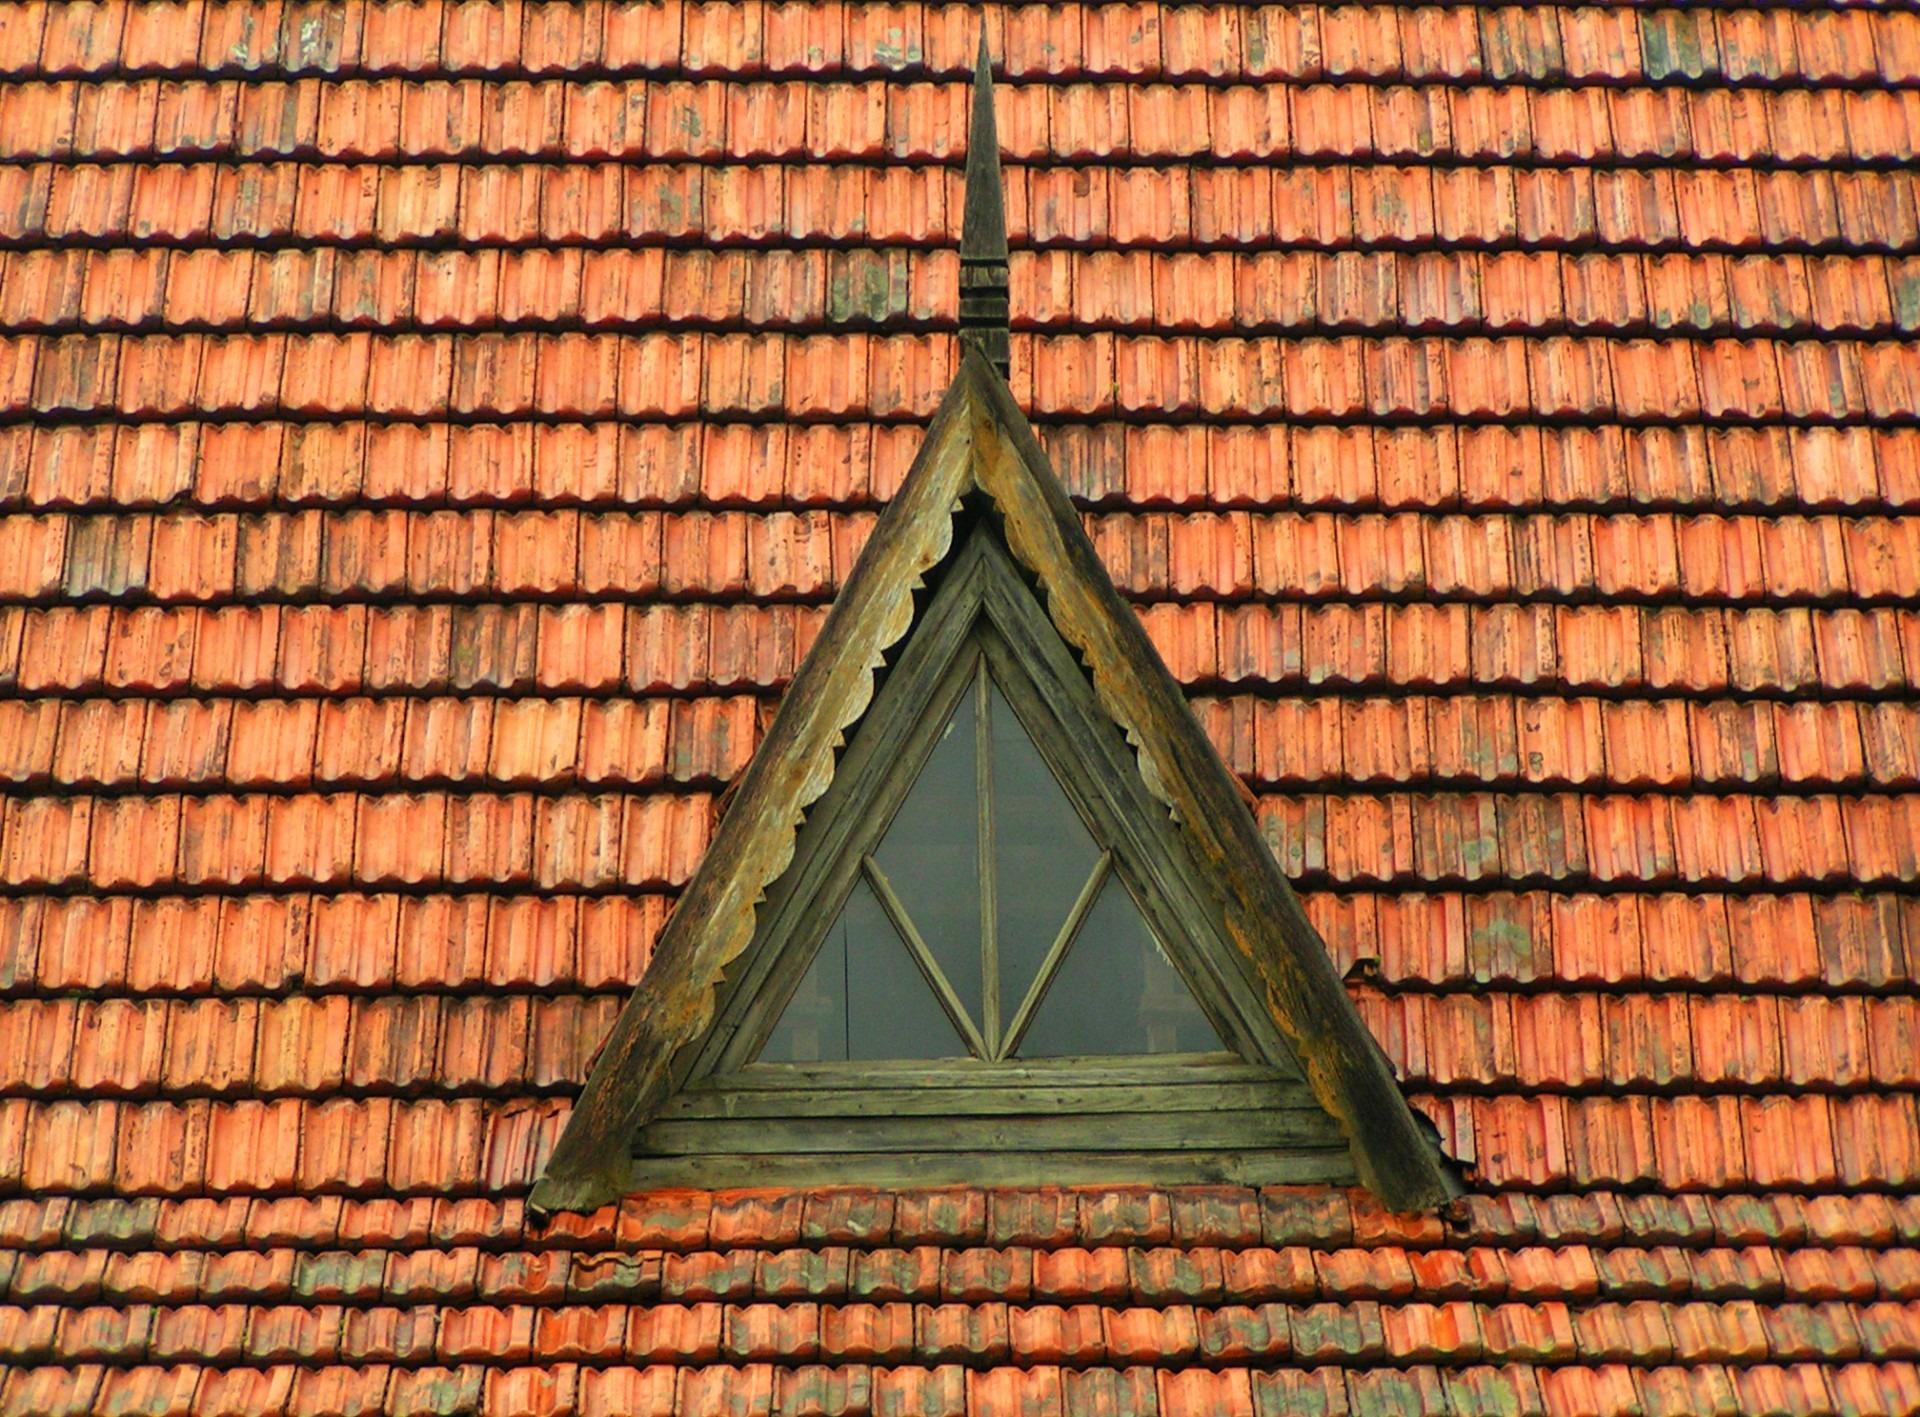 Fotos gratis : arquitectura, techo, pared, simétrico, naranja ...